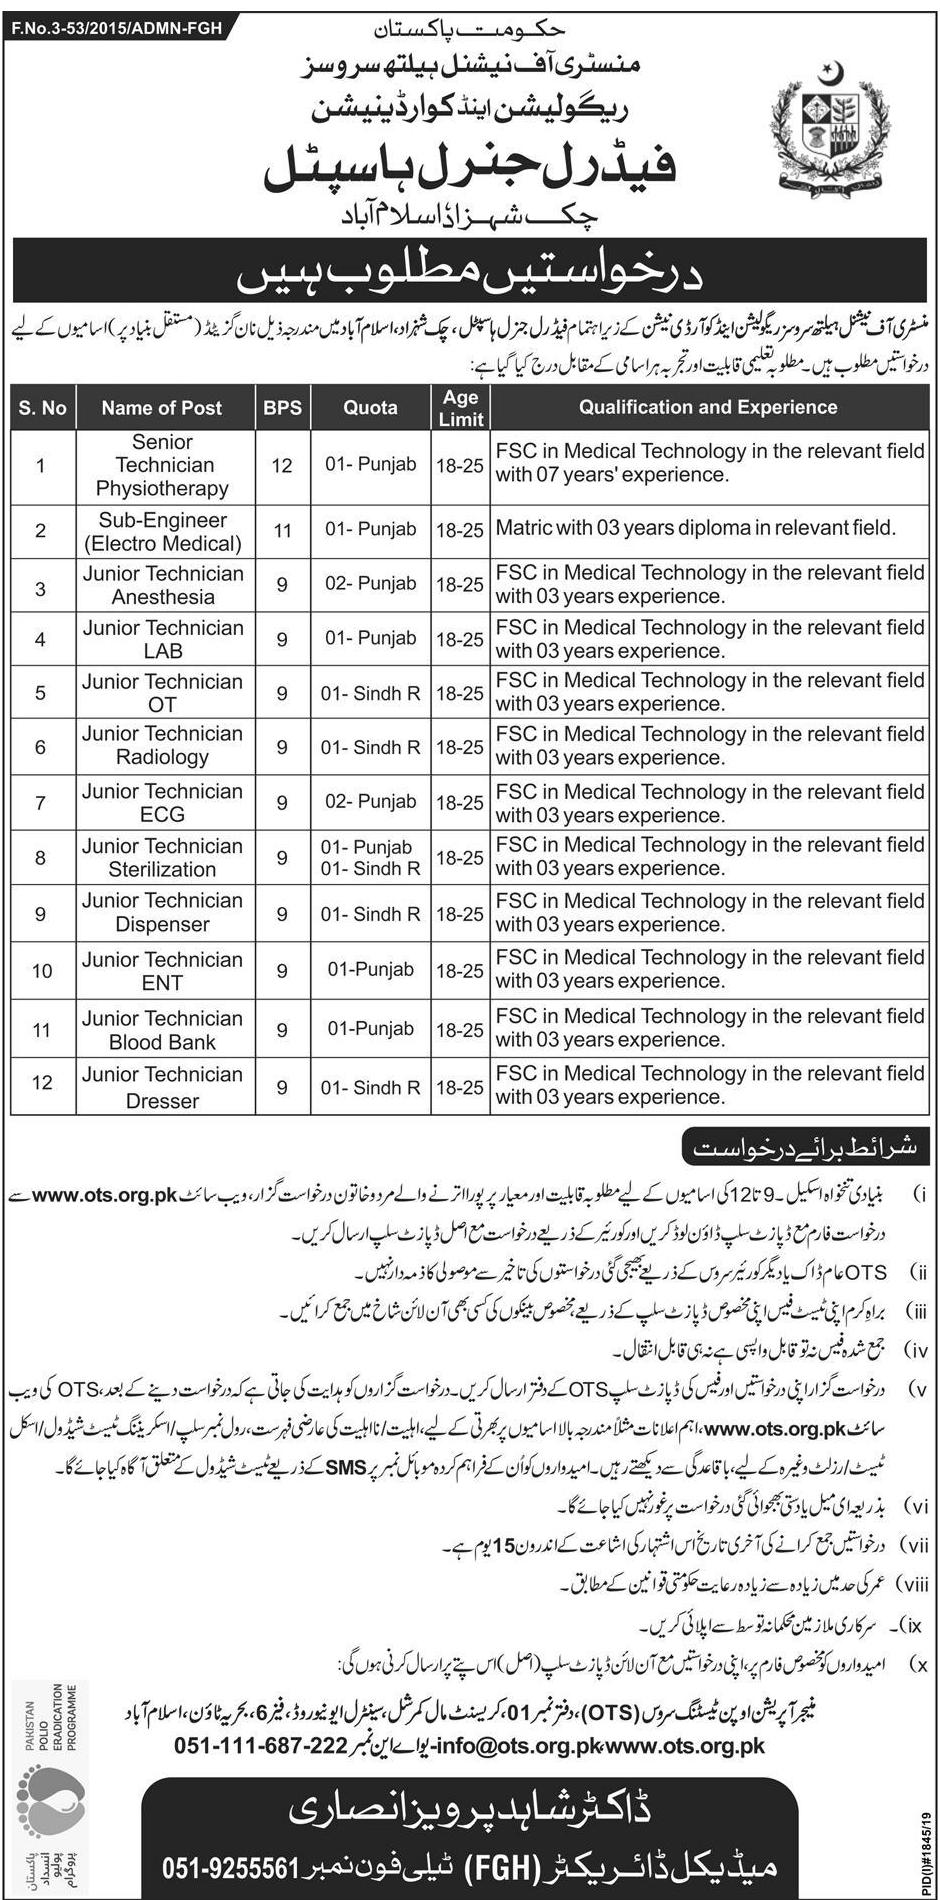 Federal General Hospital Chak Shahzad NHSRC Jobs 2019 OTS Application Form Roll No Slip